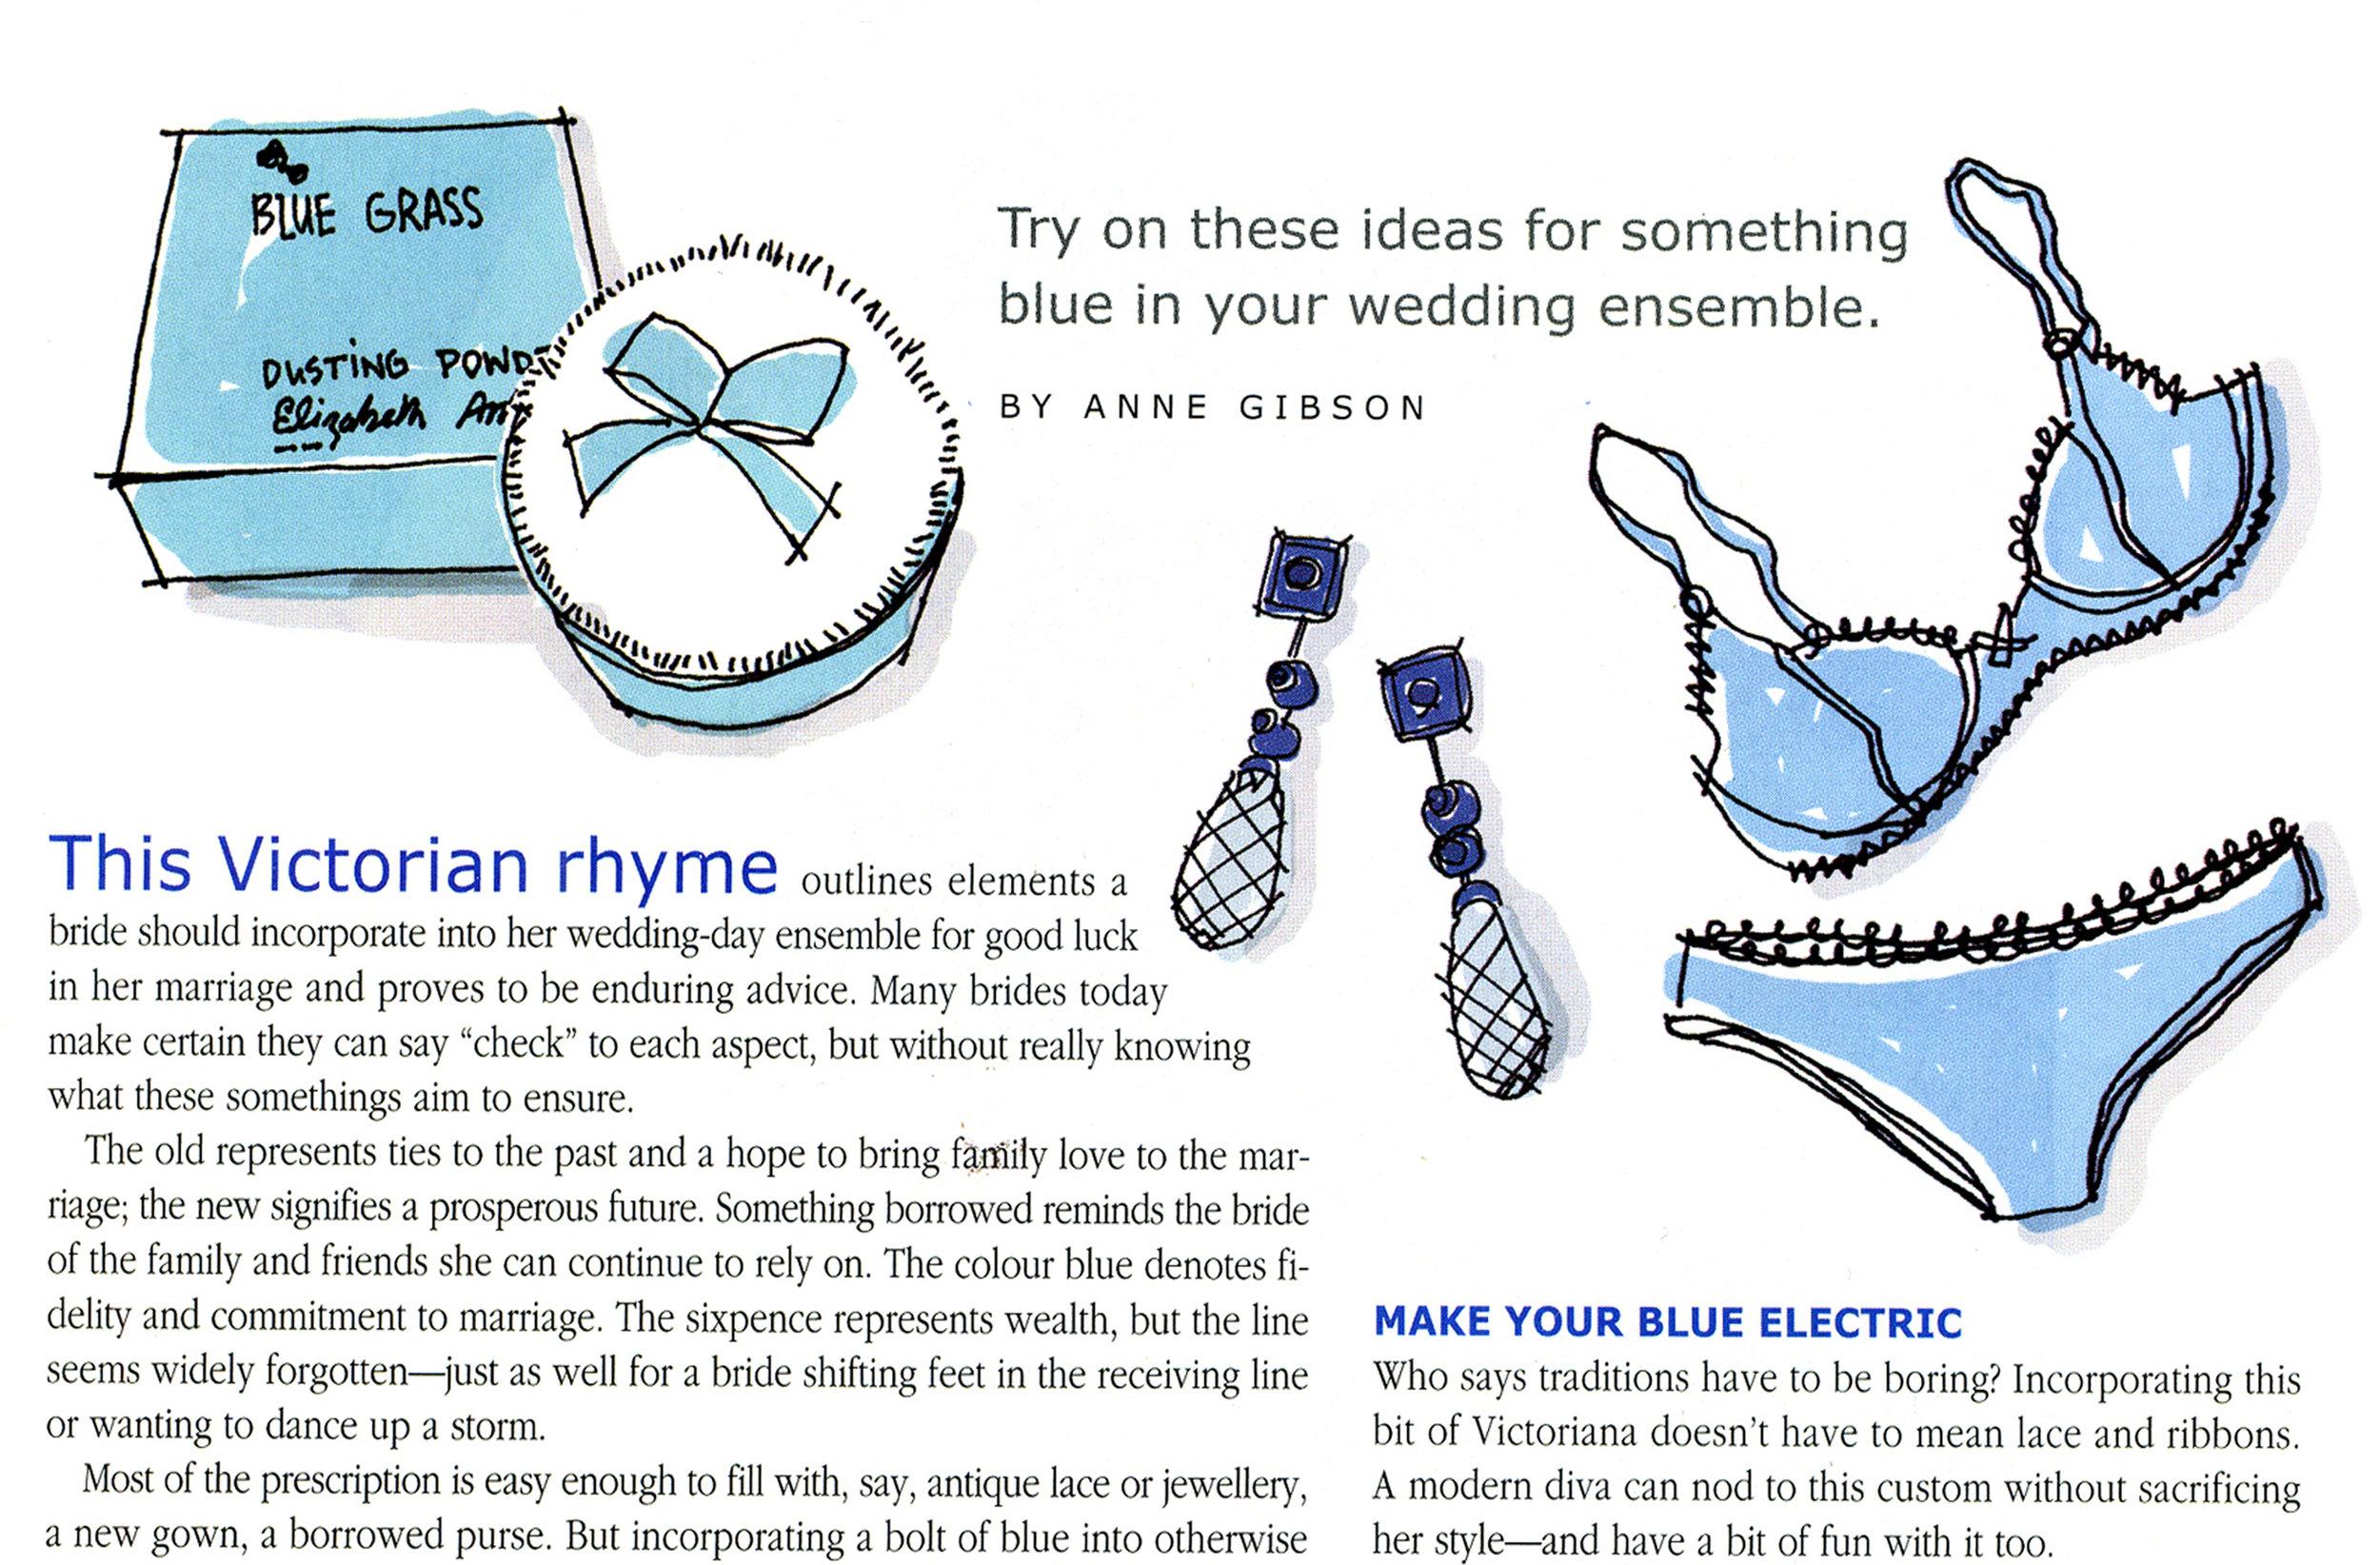 Wedding Bells magazine